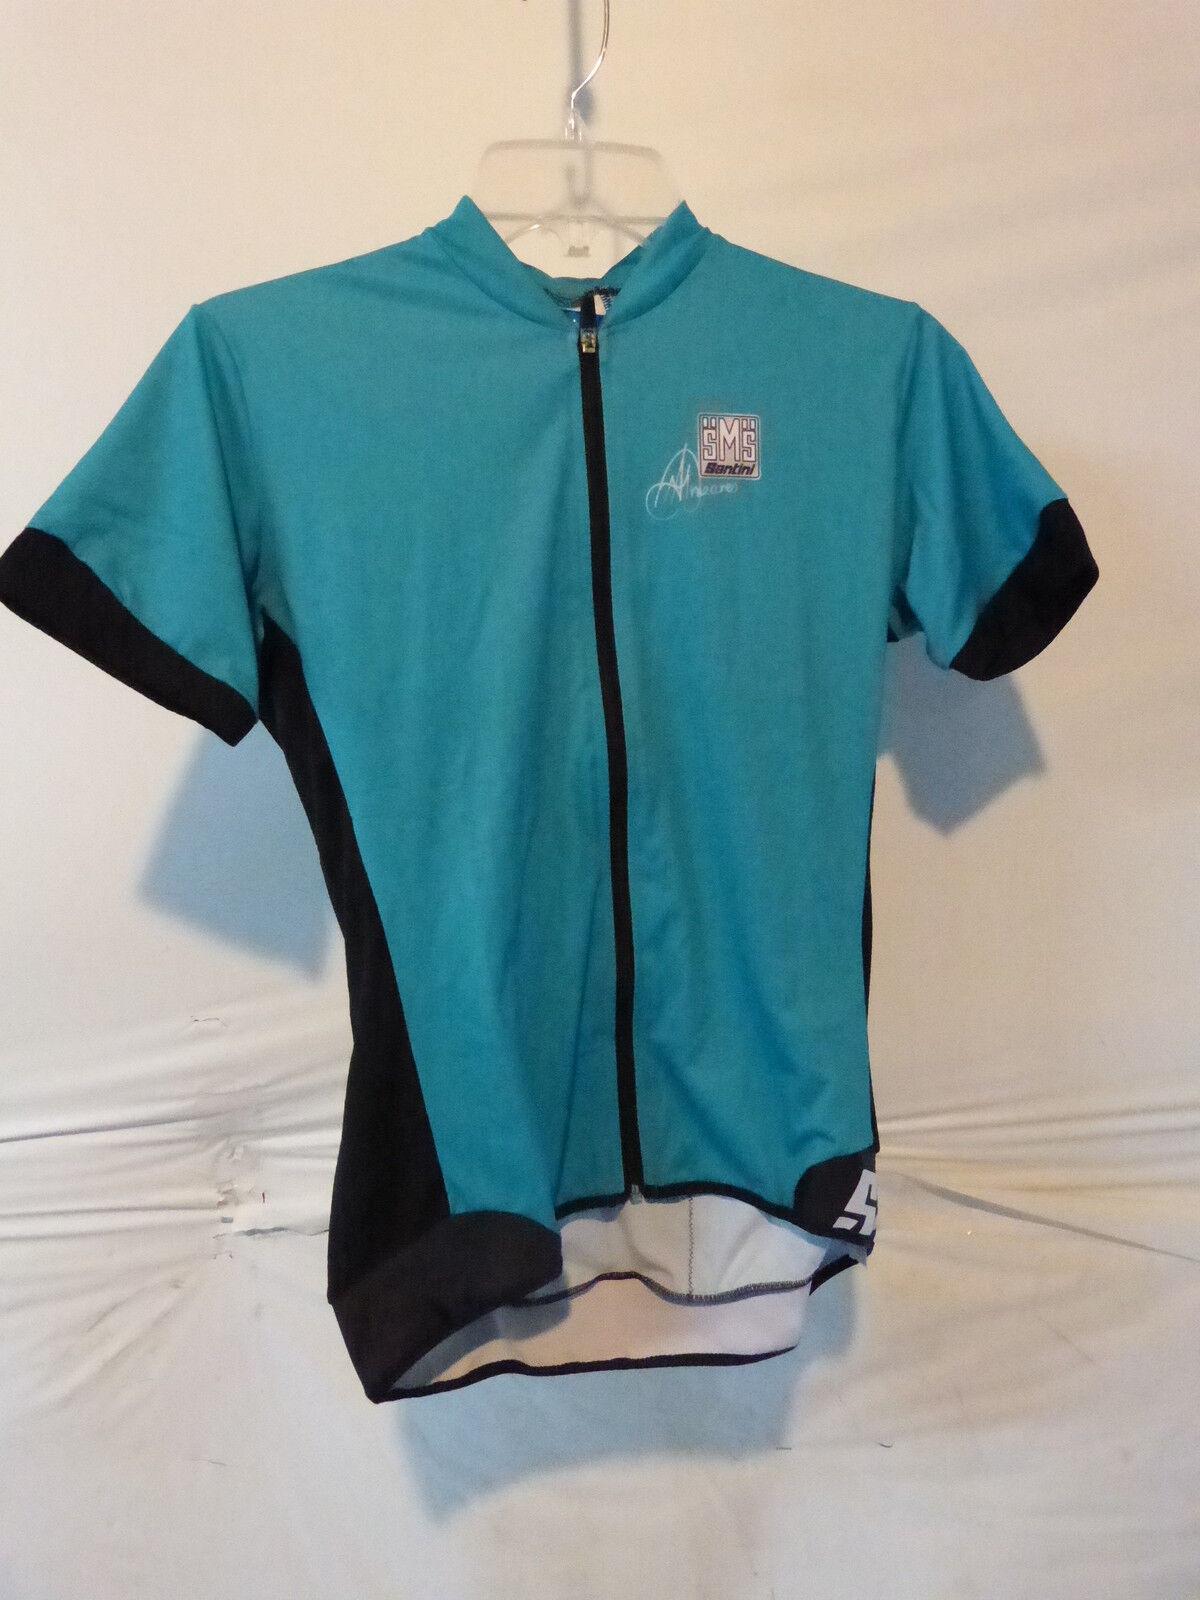 Santini  33 Womens XL Aero Short Sleeve Jersey Turquoise Retail  179.95  100% price guarantee